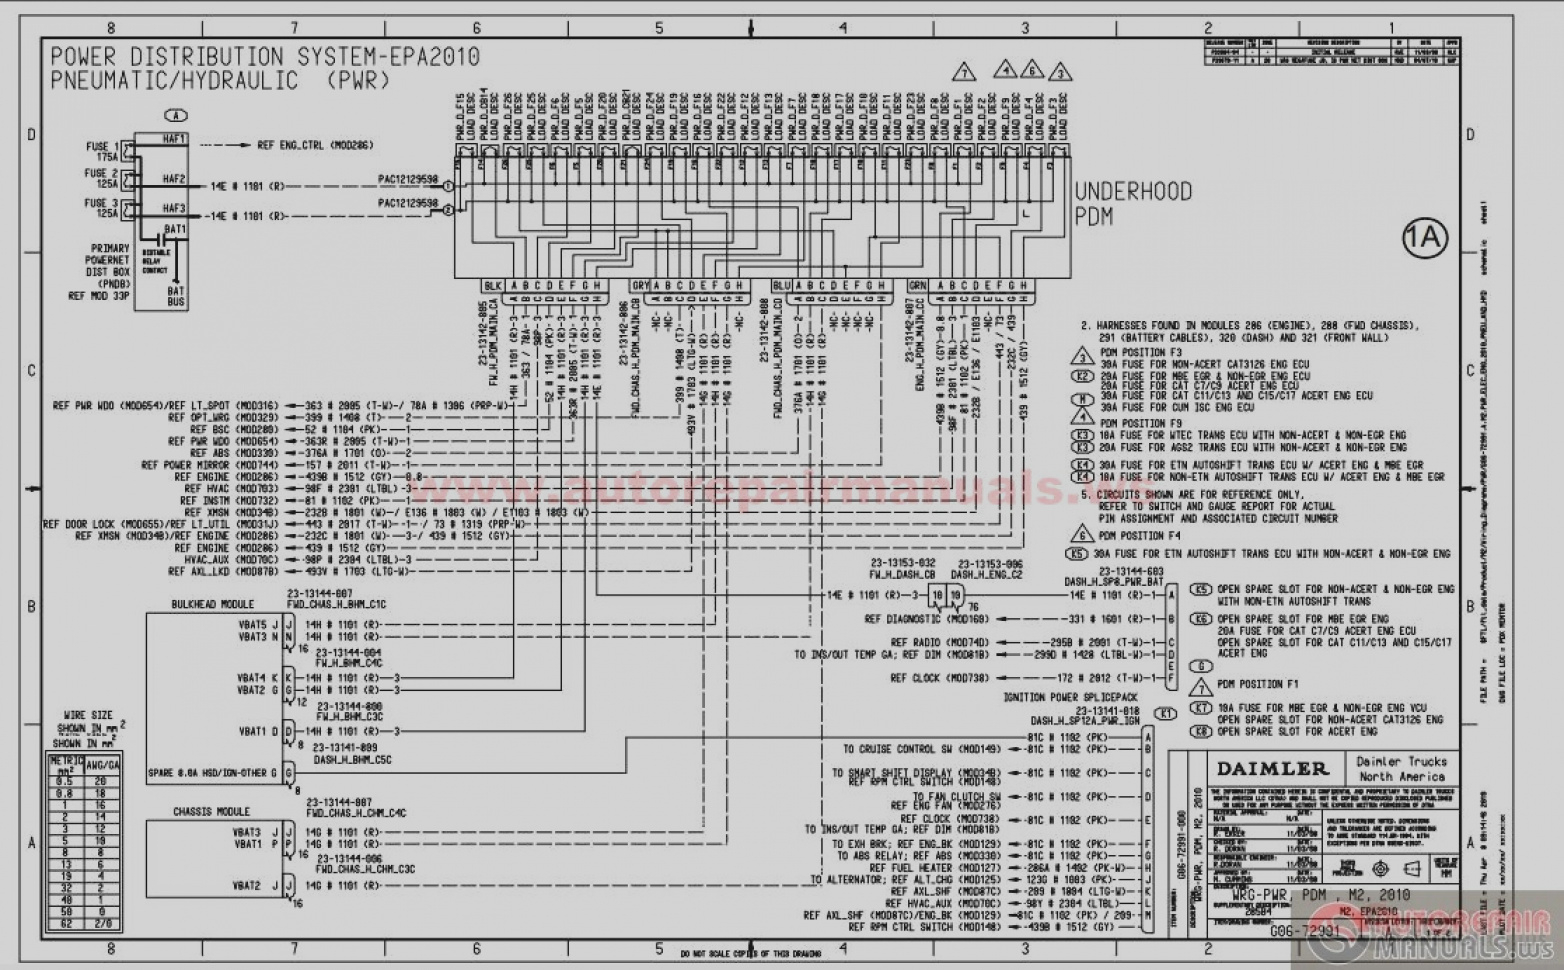 2000 freightliner century wiring diagram wiring diagramcascadia fuse diagram best part of wiring diagramfreightliner radio wiring diagram wiring diagram specialties2005 freightliner radio